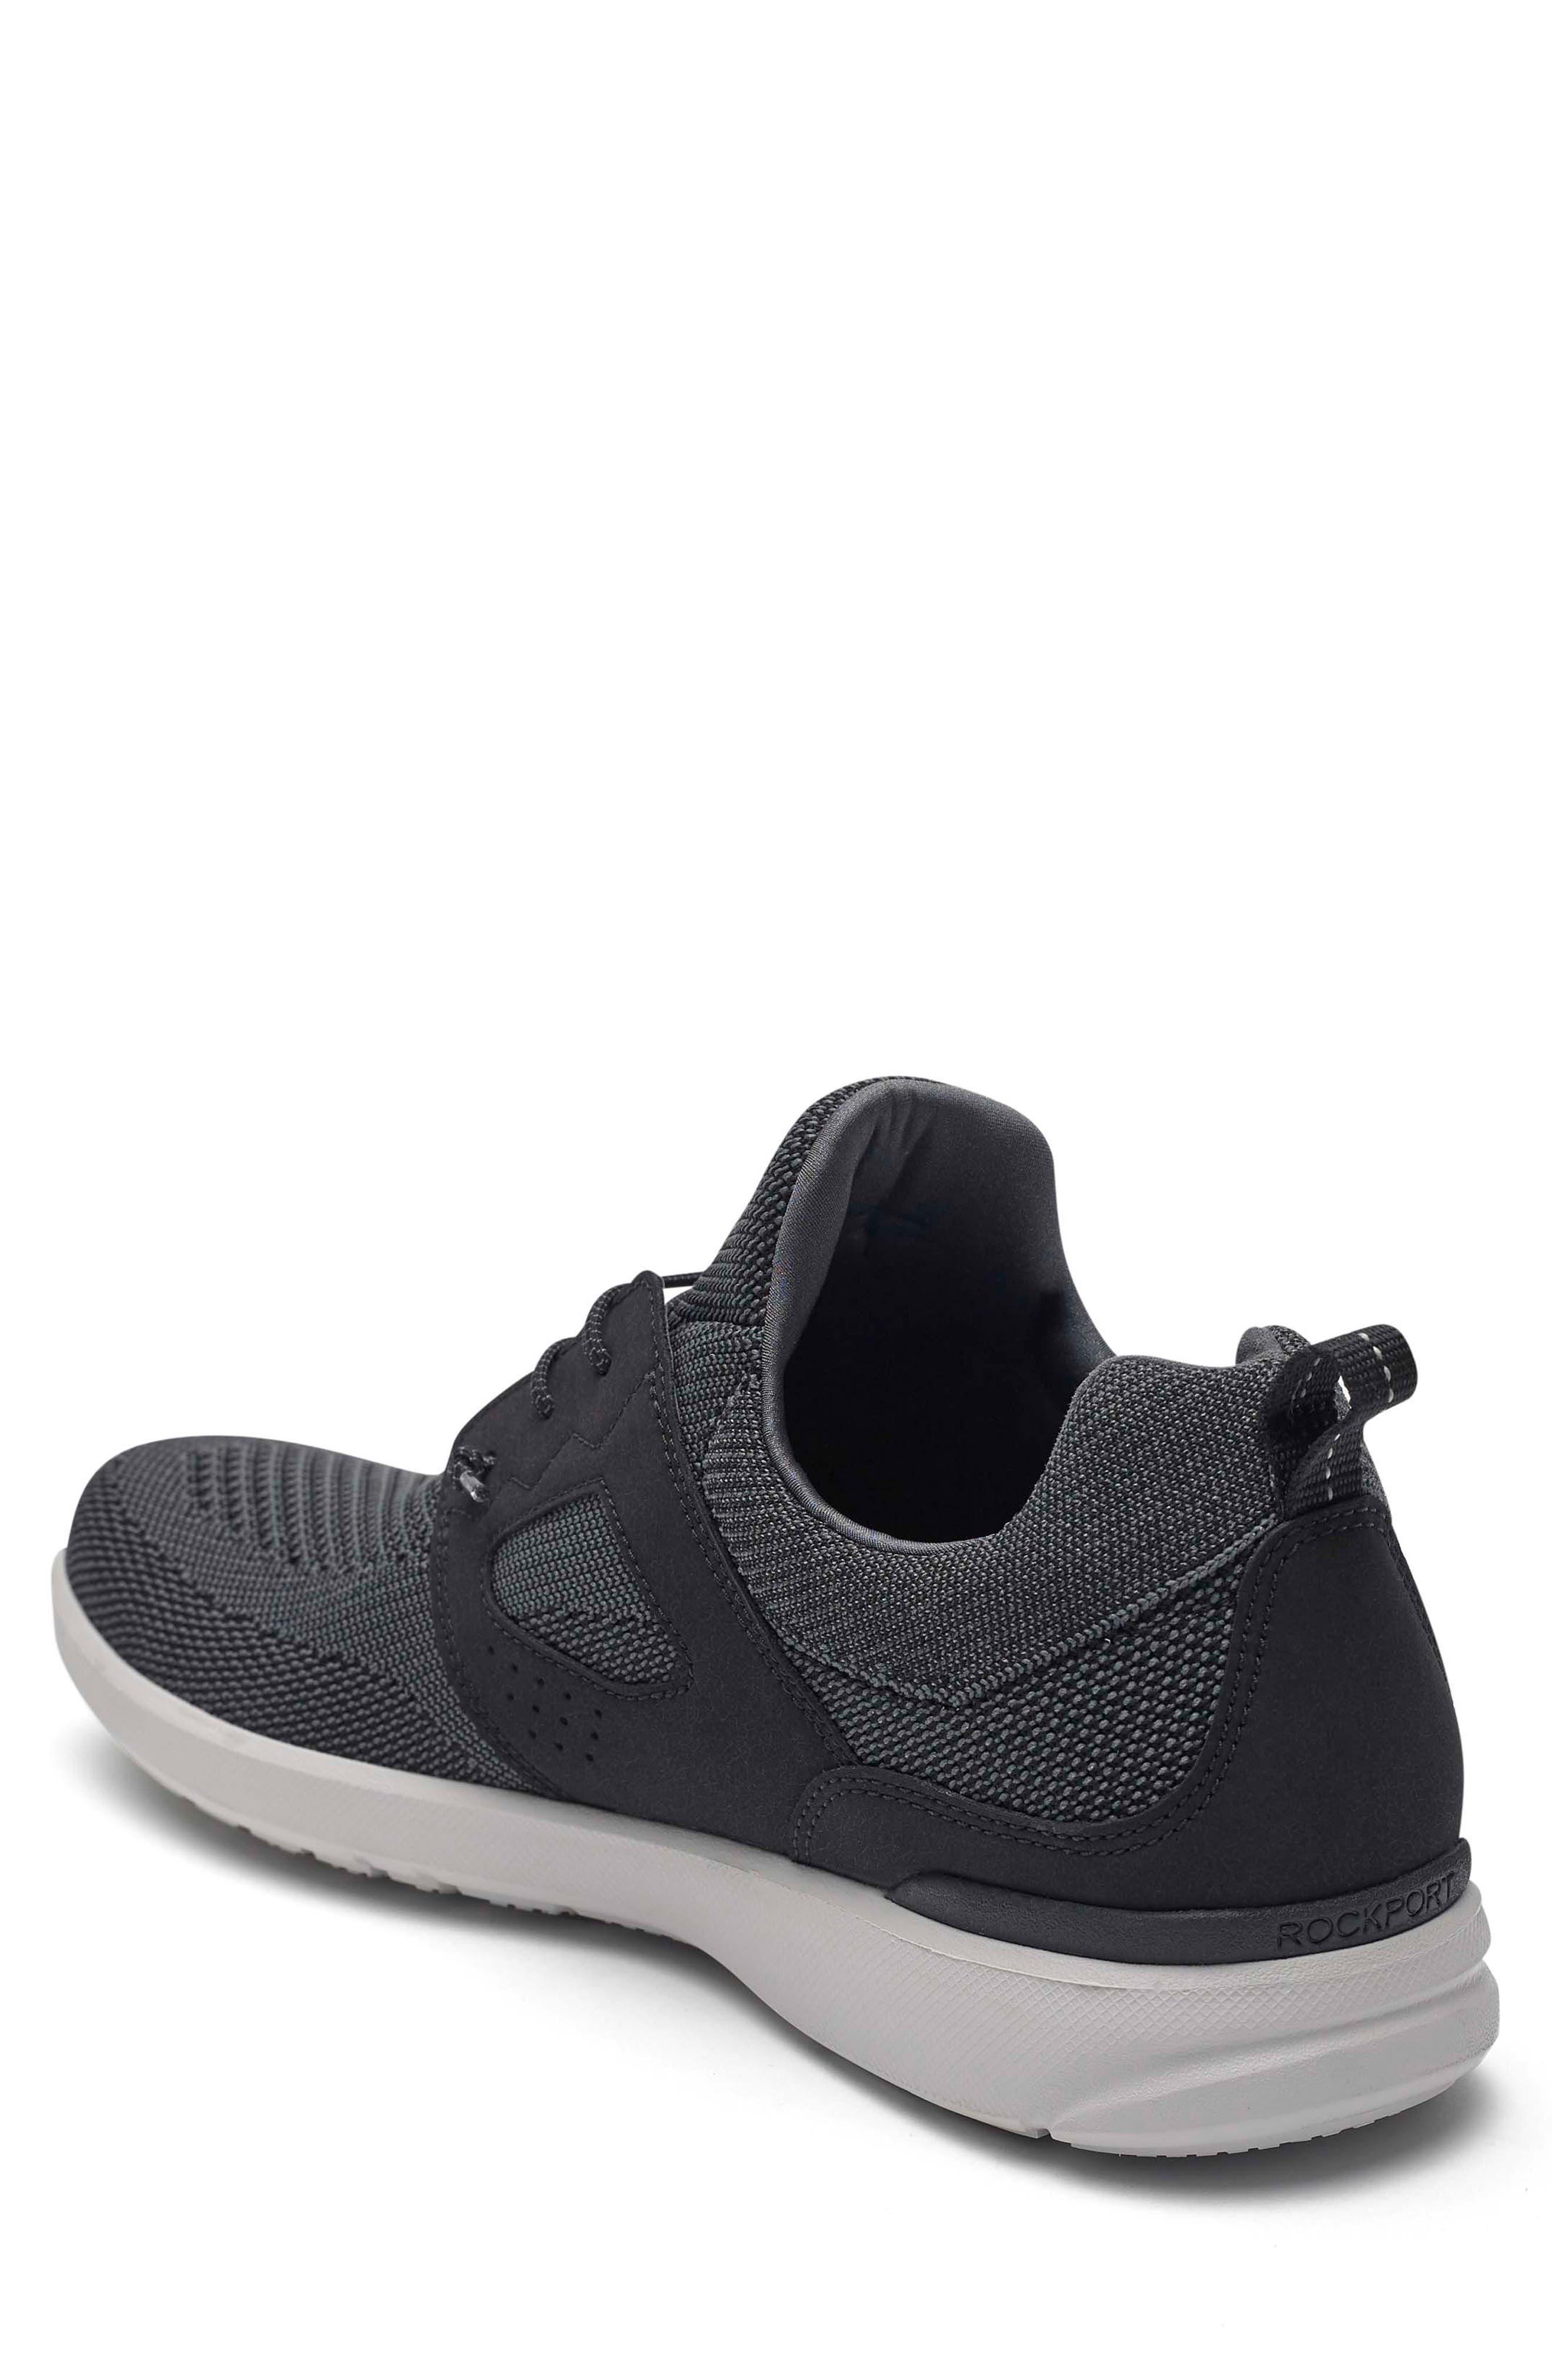 Alternate Image 2  - Rockport truFlex Sneaker (Men)